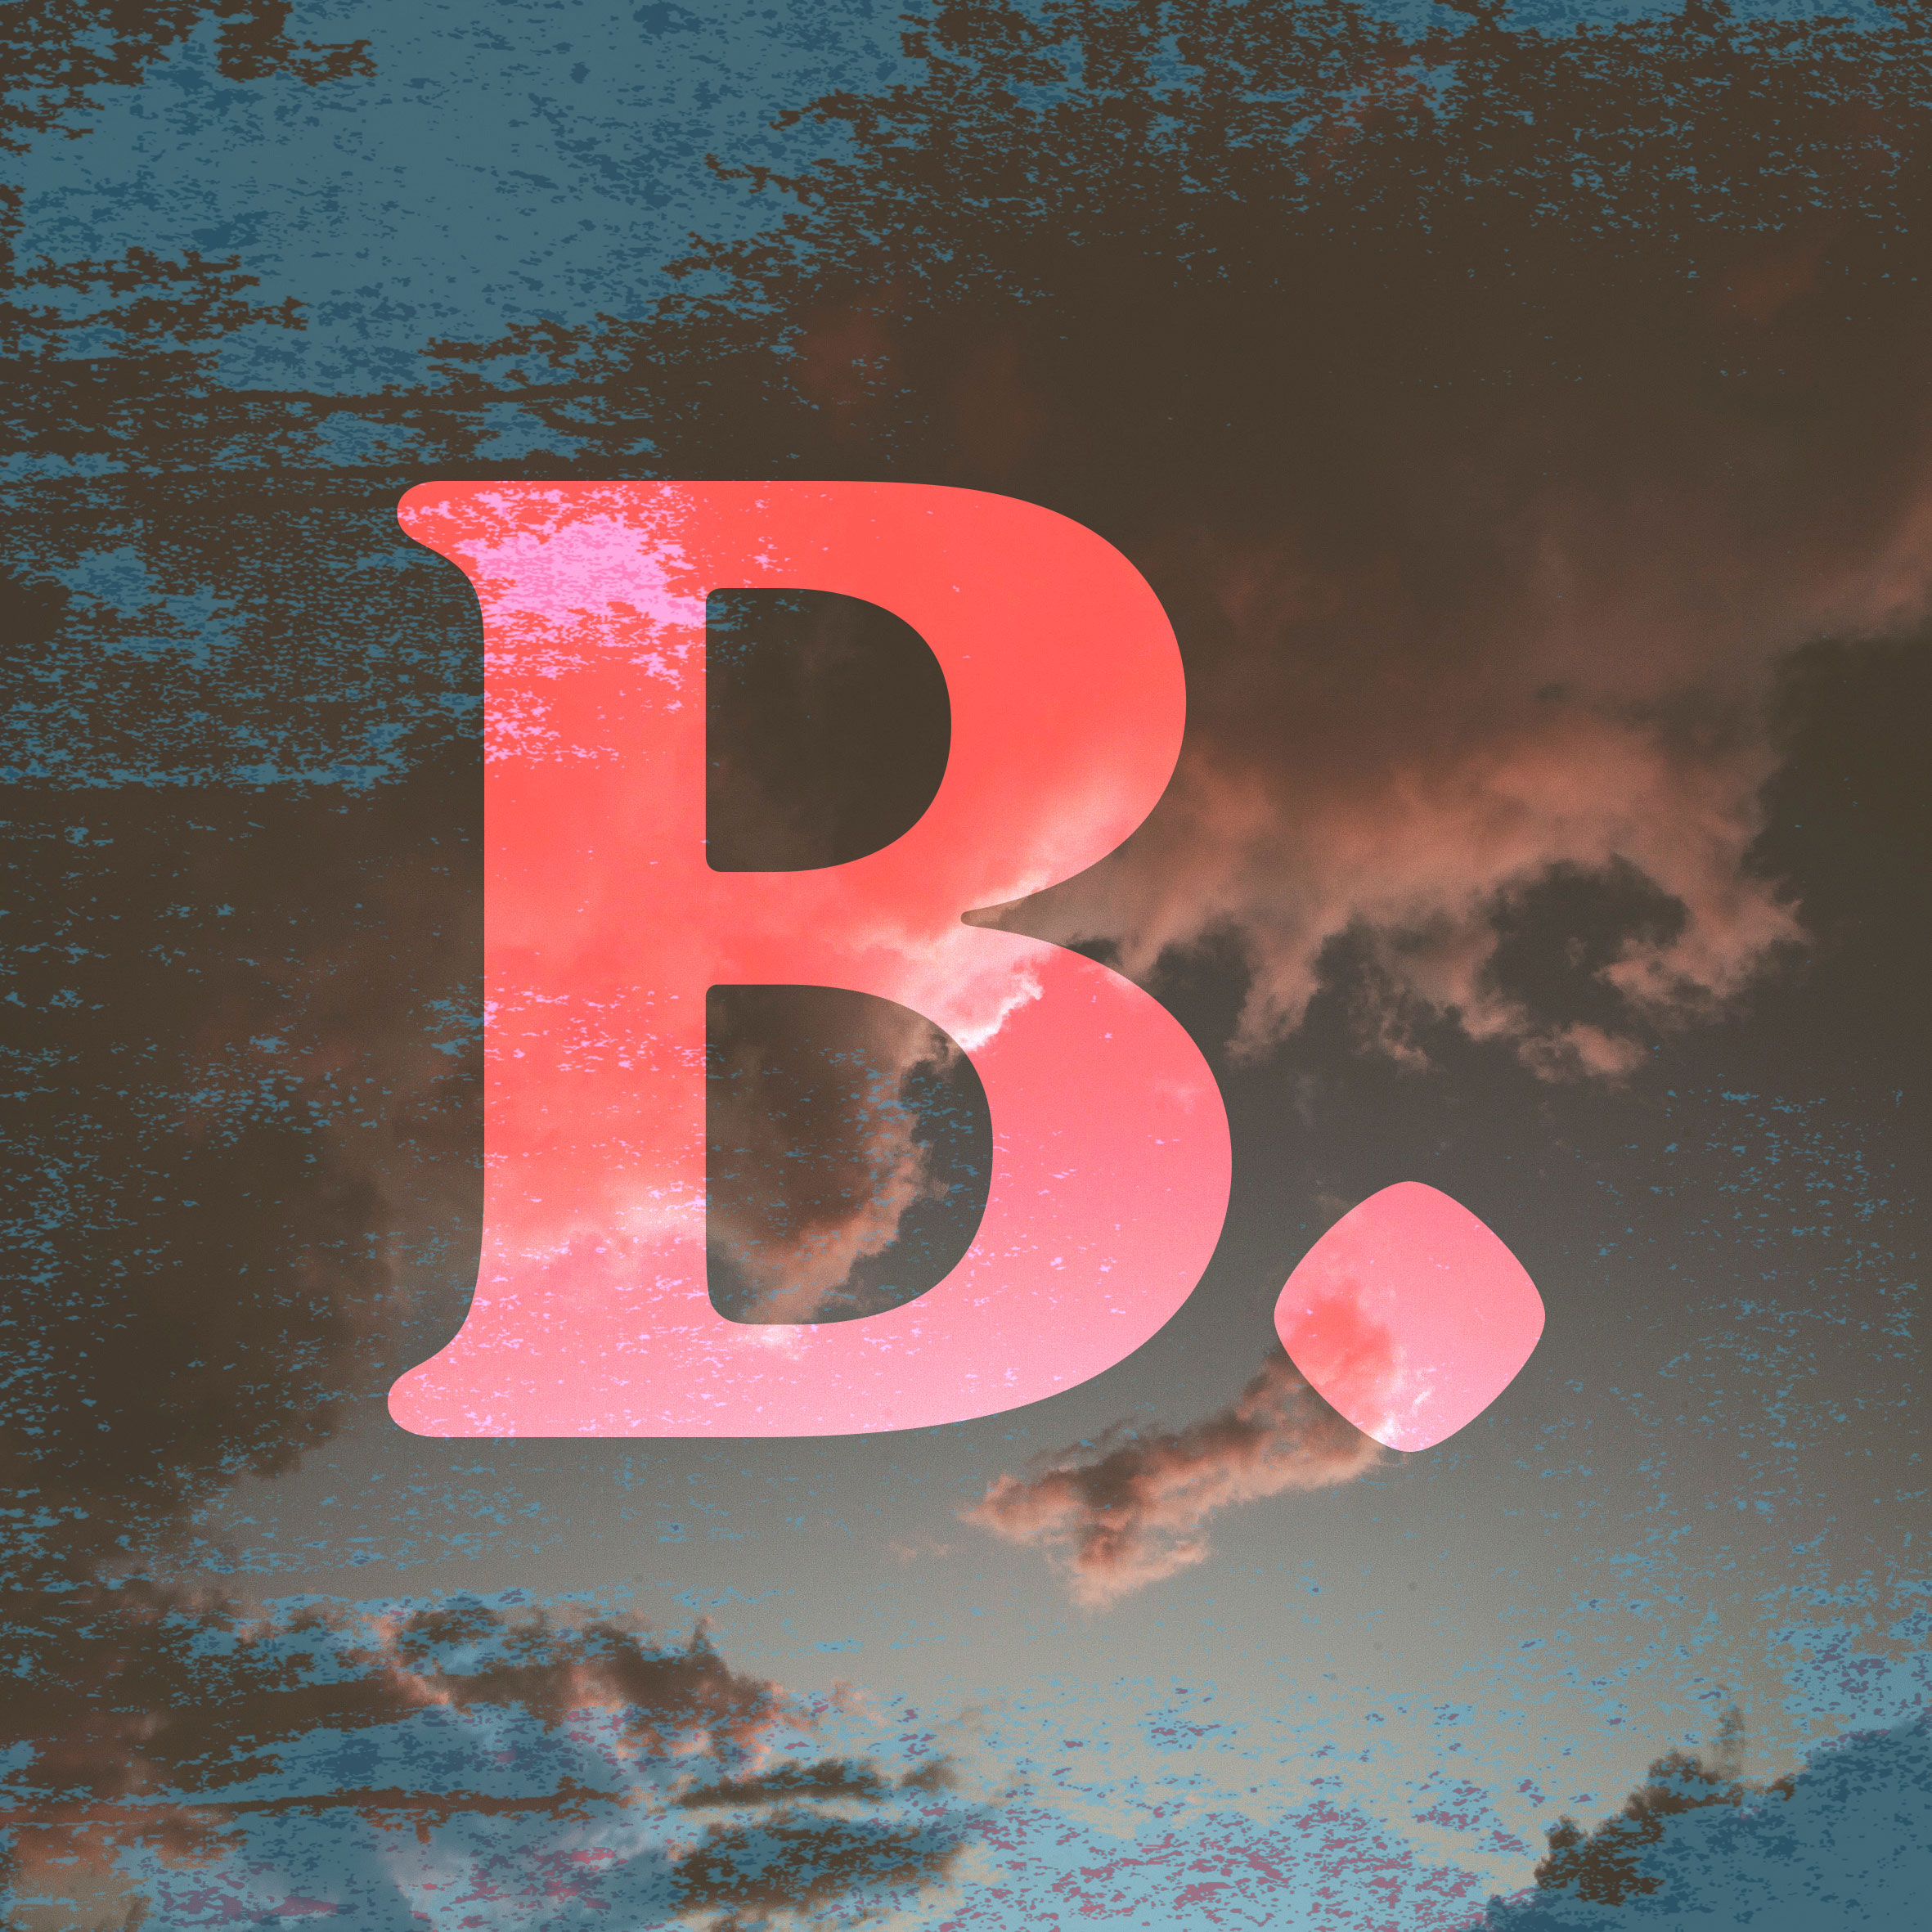 Brash_Cloud_Square